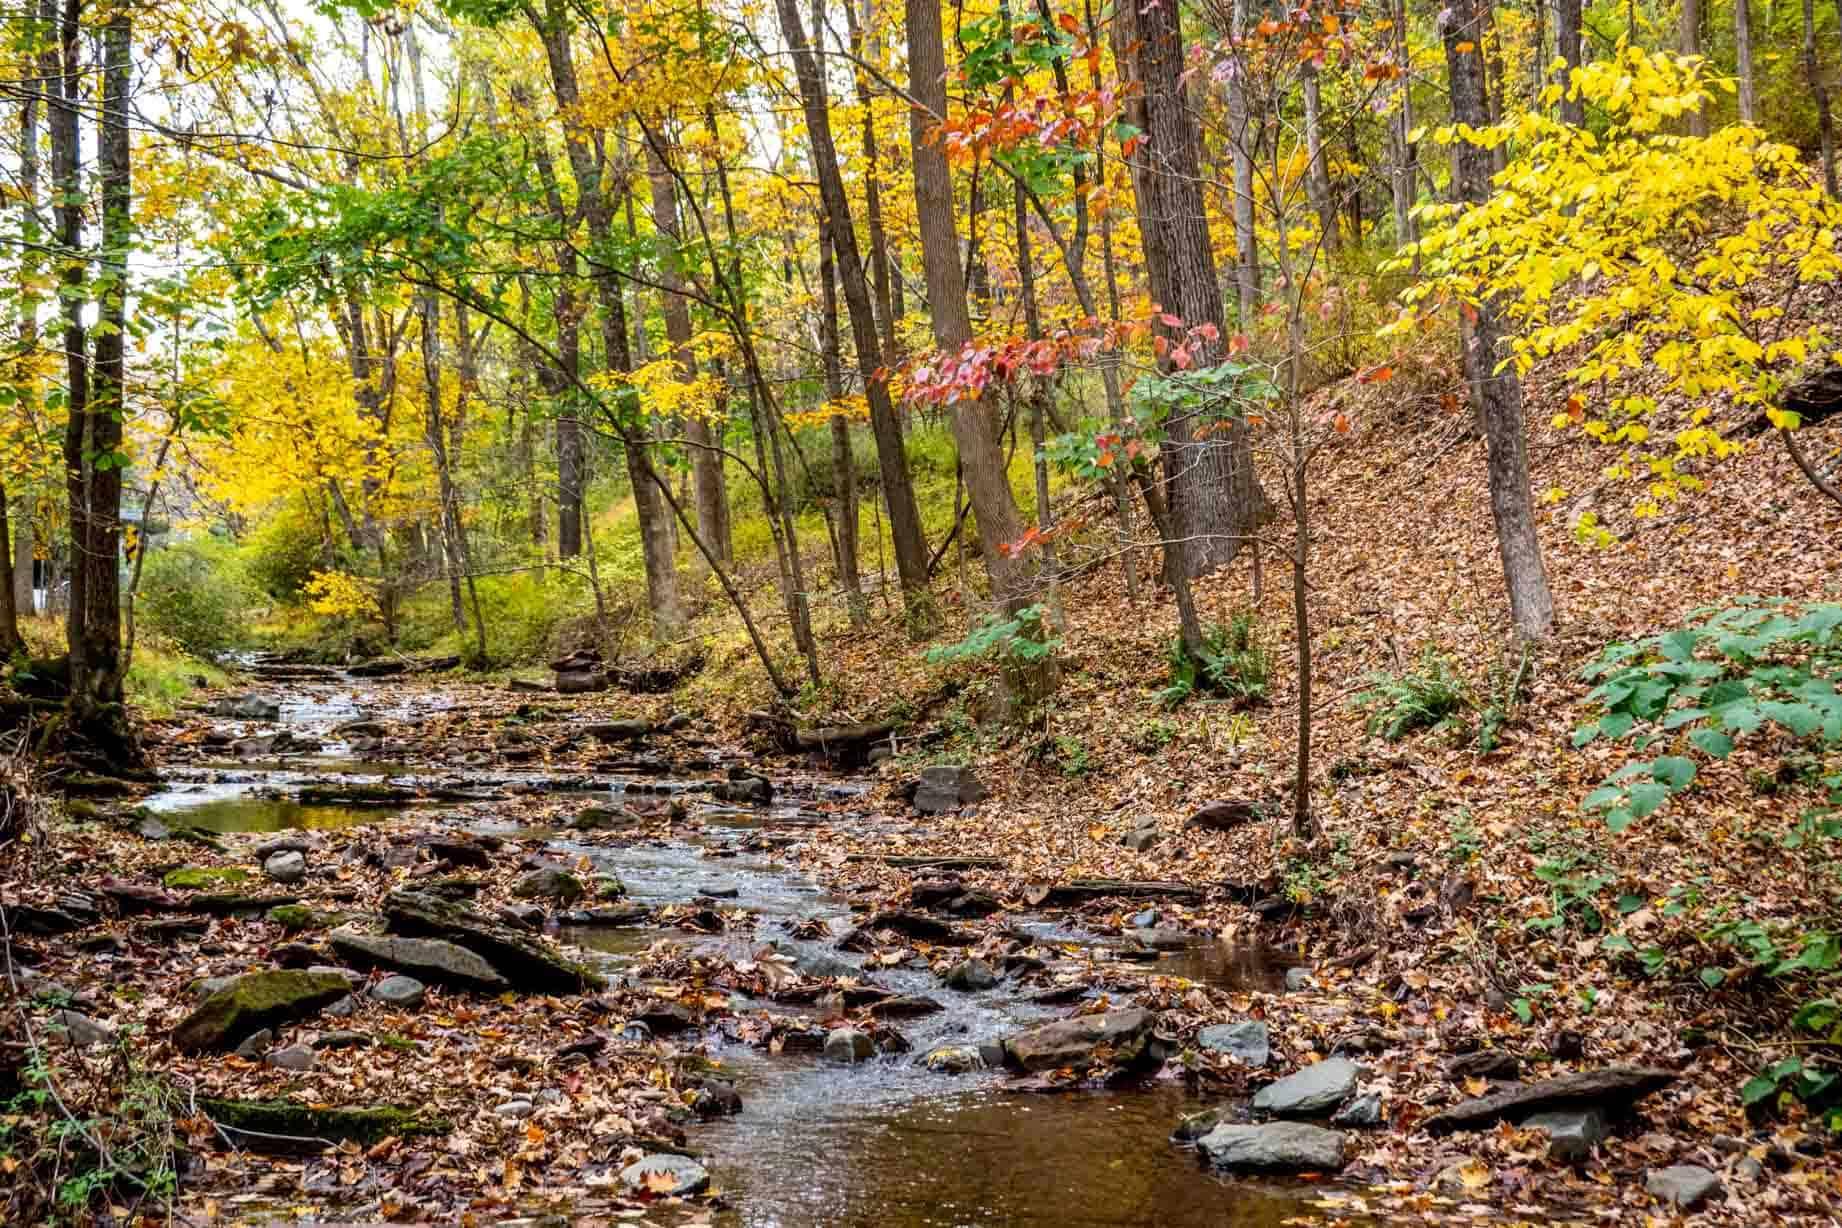 Stream running through trees in autumn